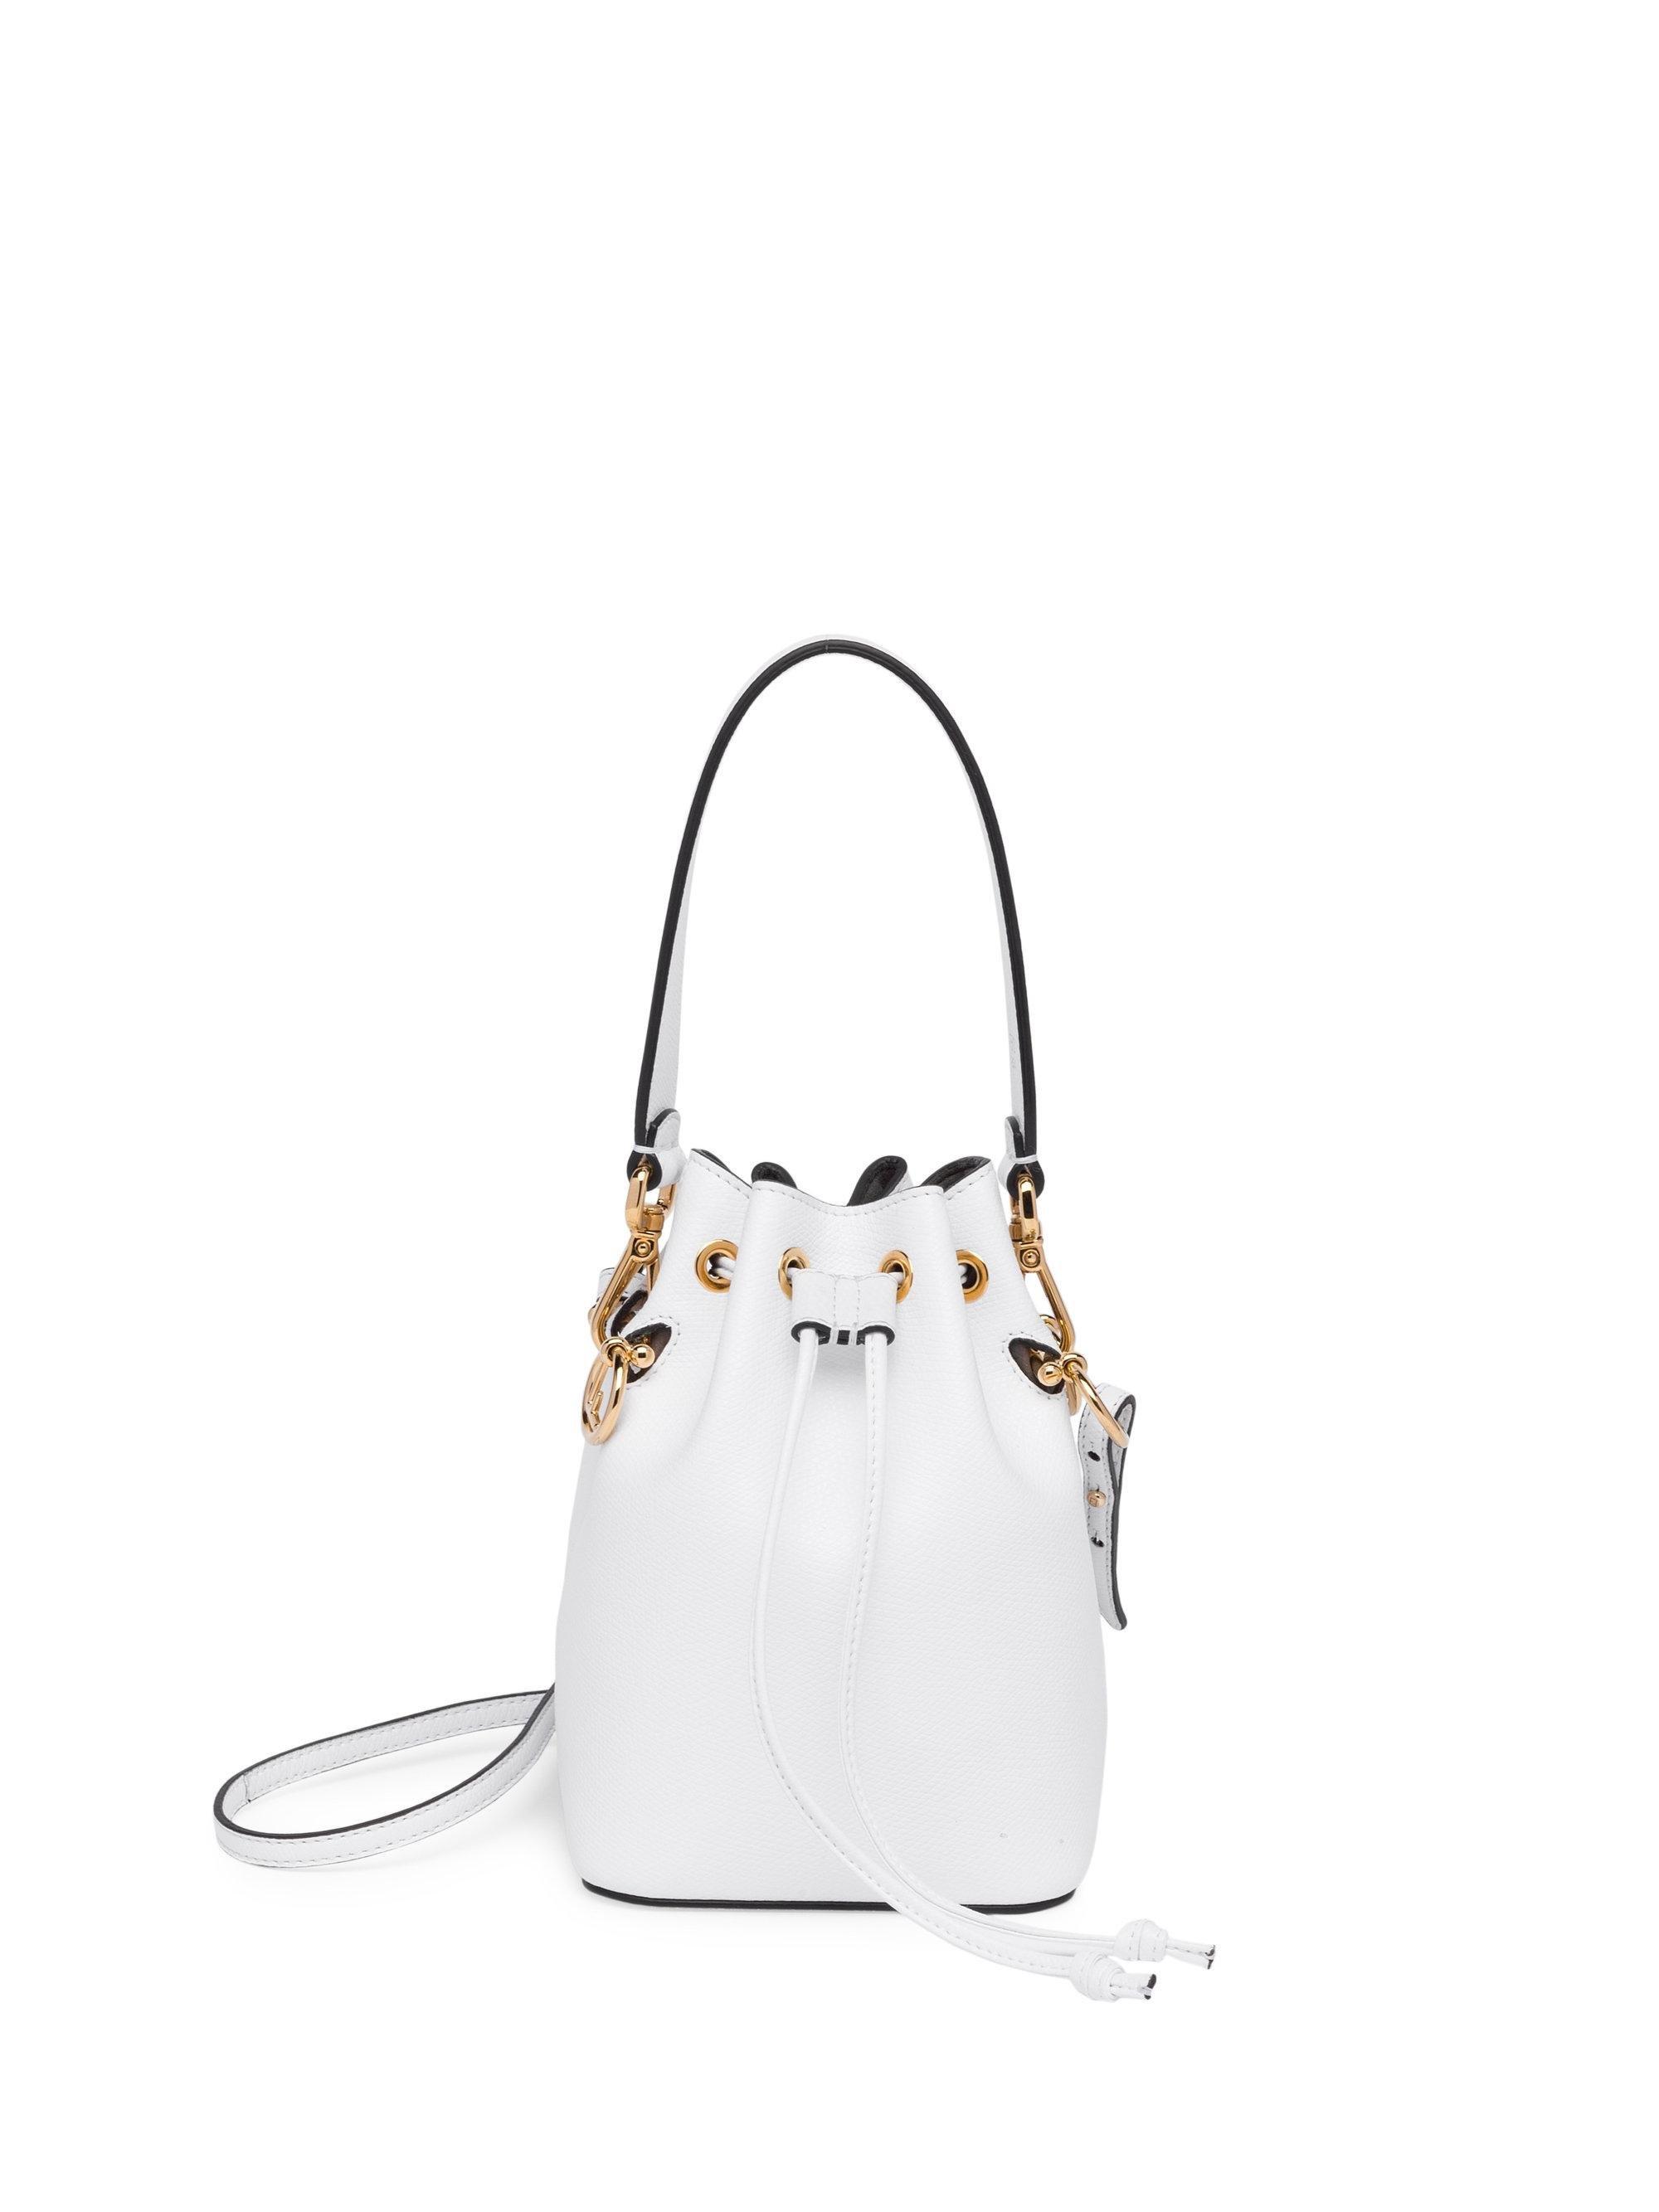 Fendi Mon Tresor Leather Bucket Bag in White - Save 10% - Lyst